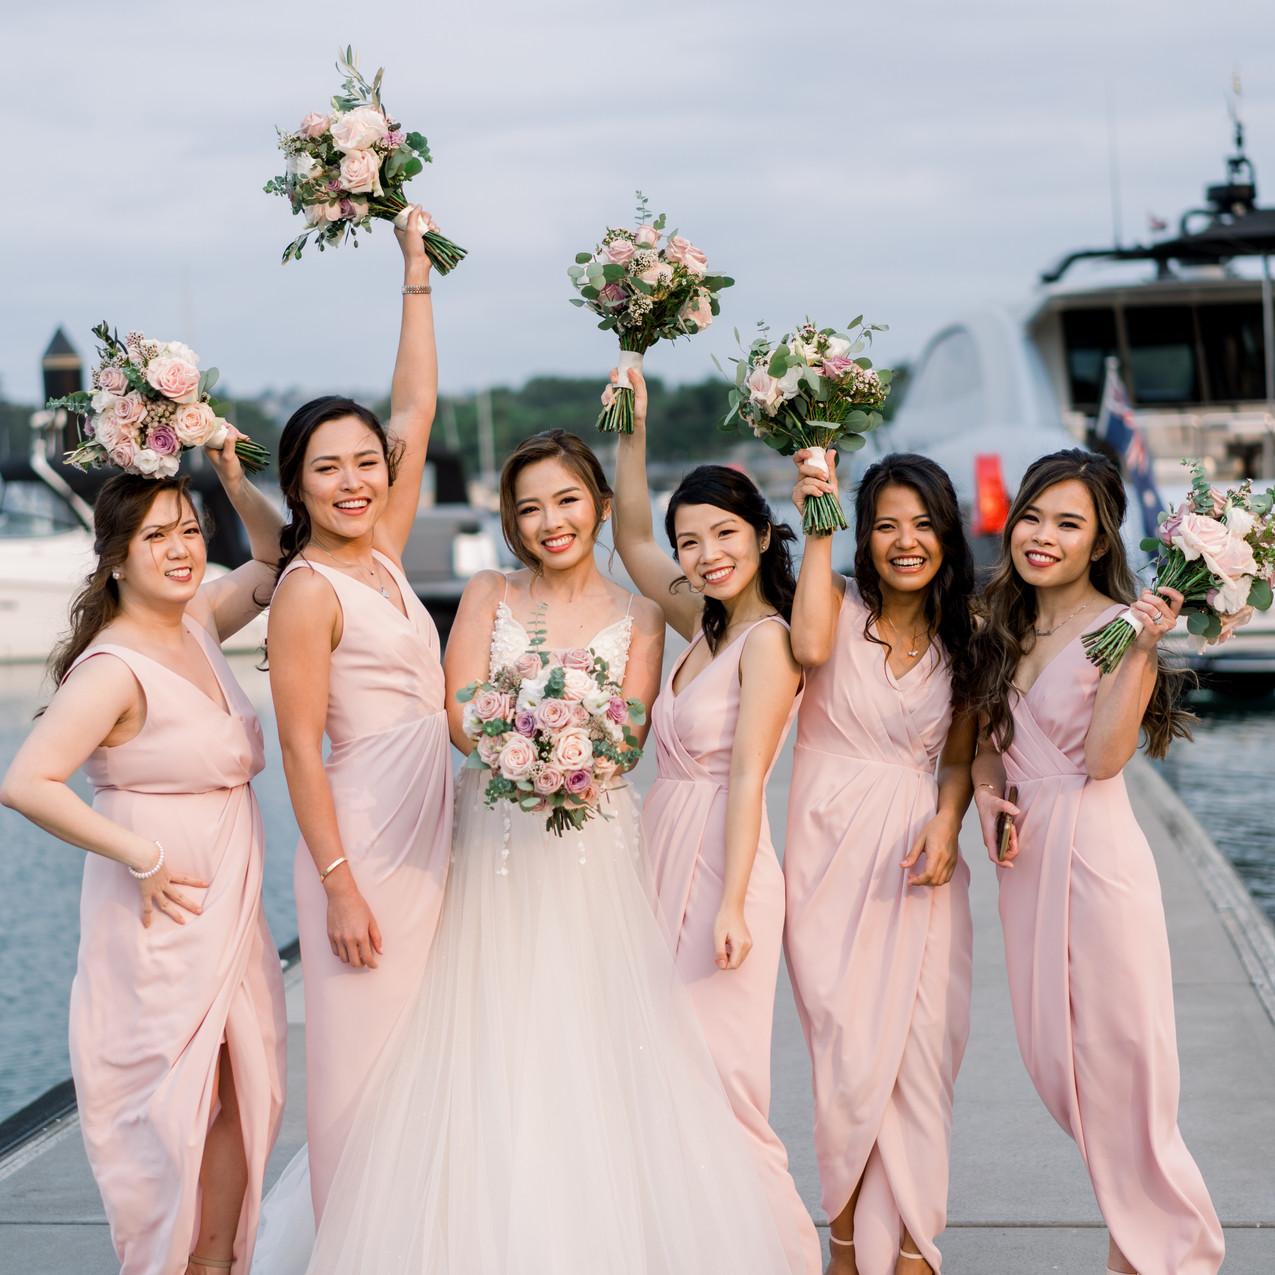 Best Bridesmaids Dresses